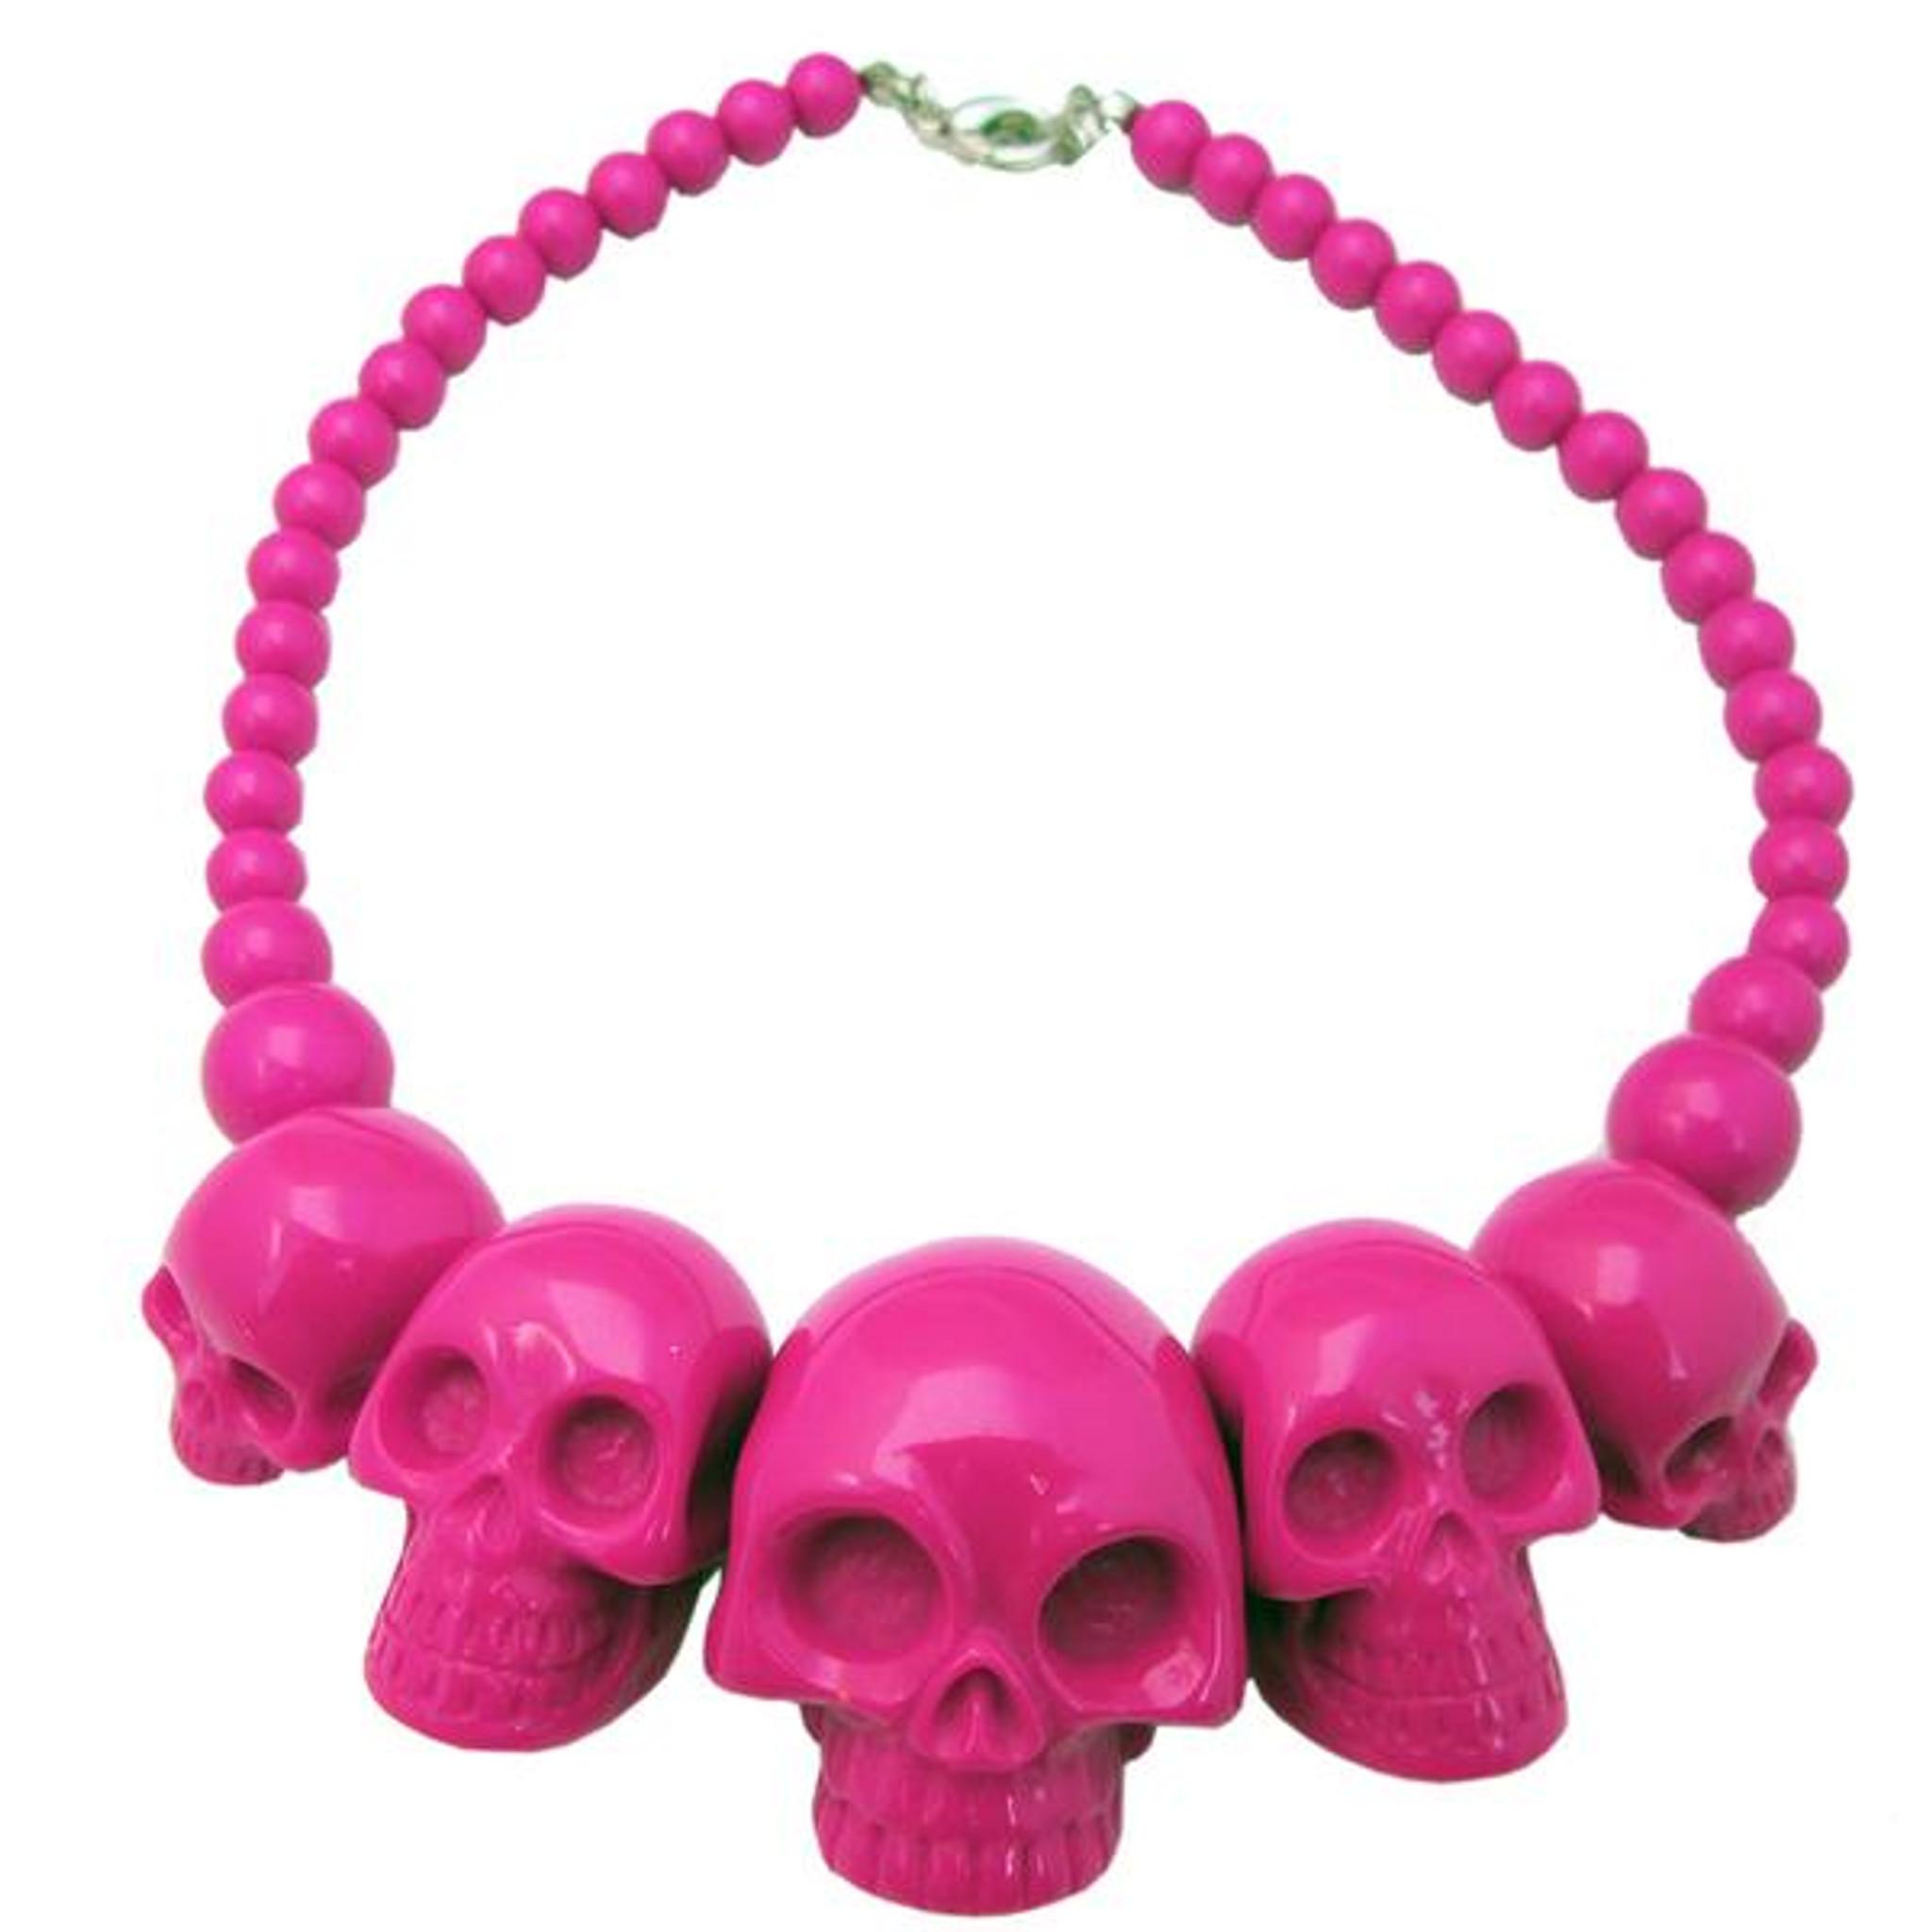 Pink skull necklace